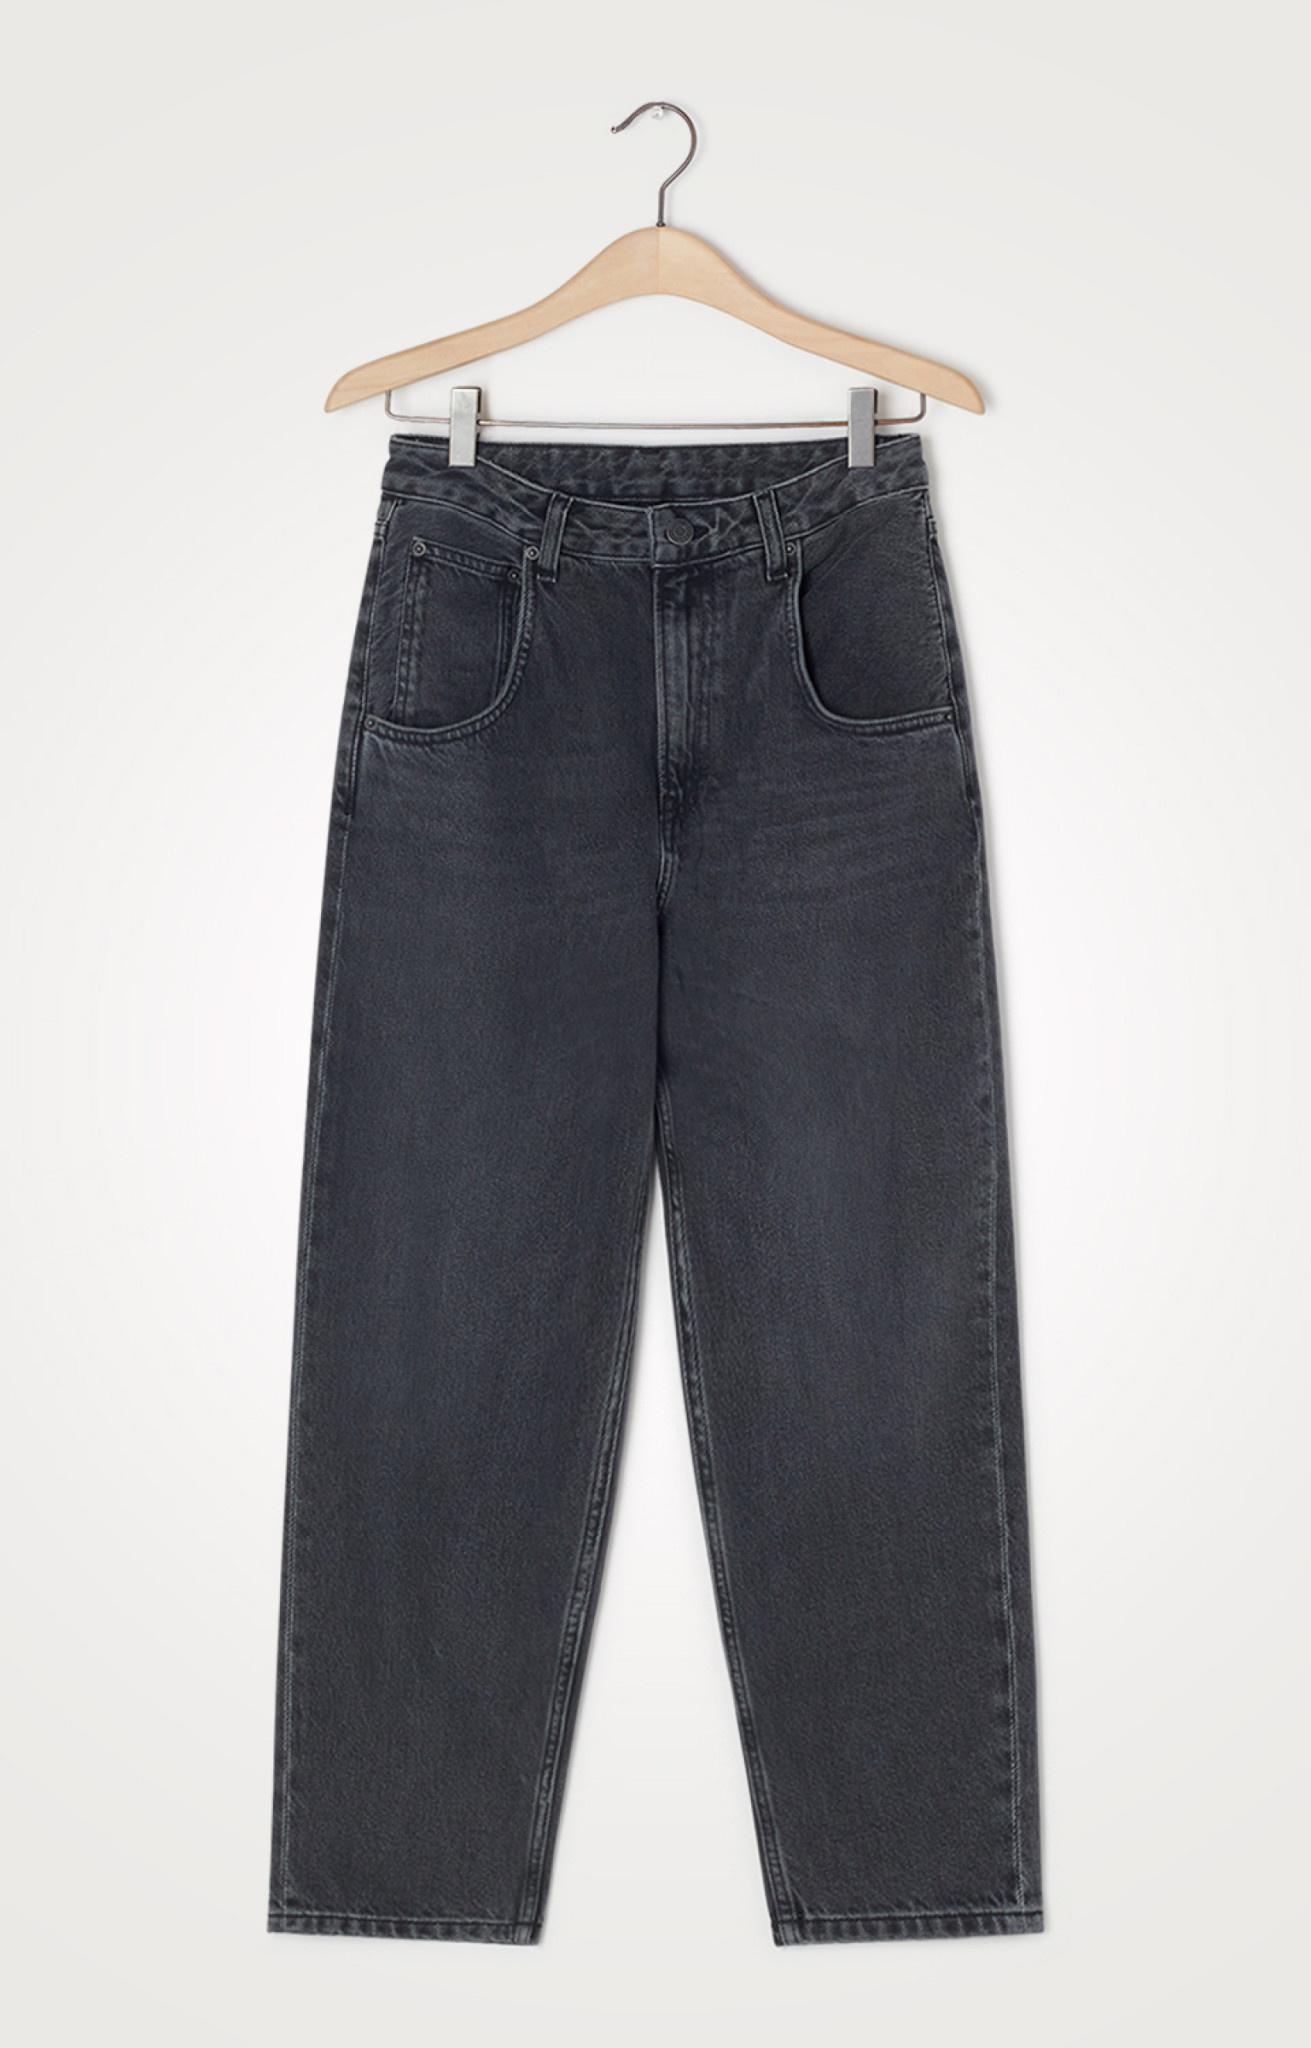 Yopday Black High Big Carrot Jeans-1